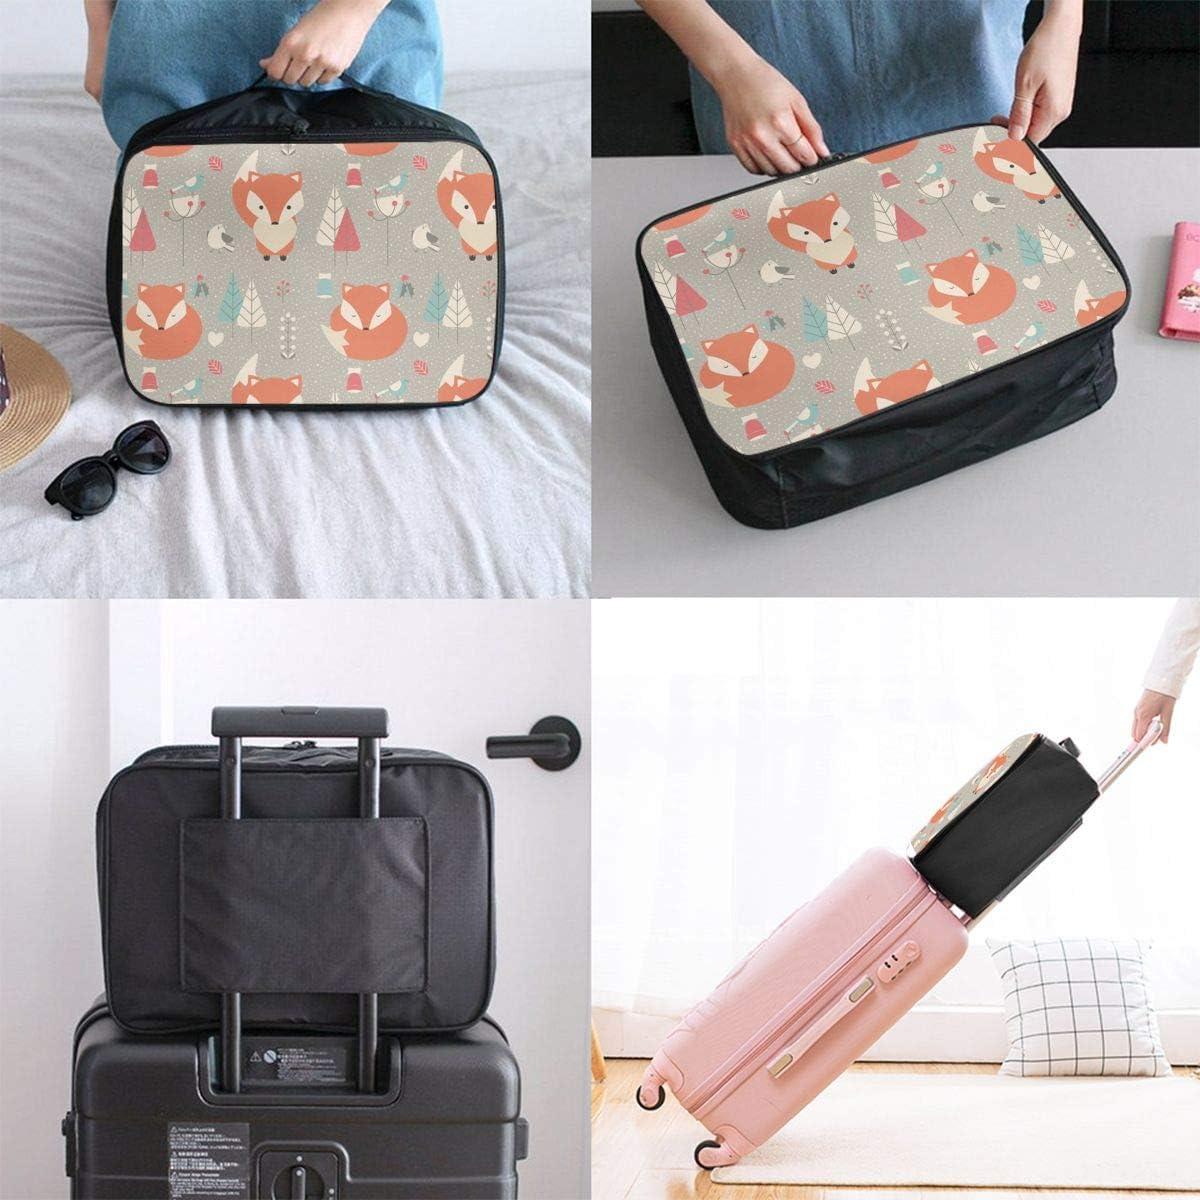 Fox Trees Travel Carry-on Luggage Weekender Bag Overnight Tote Flight Duffel In Trolley Handle